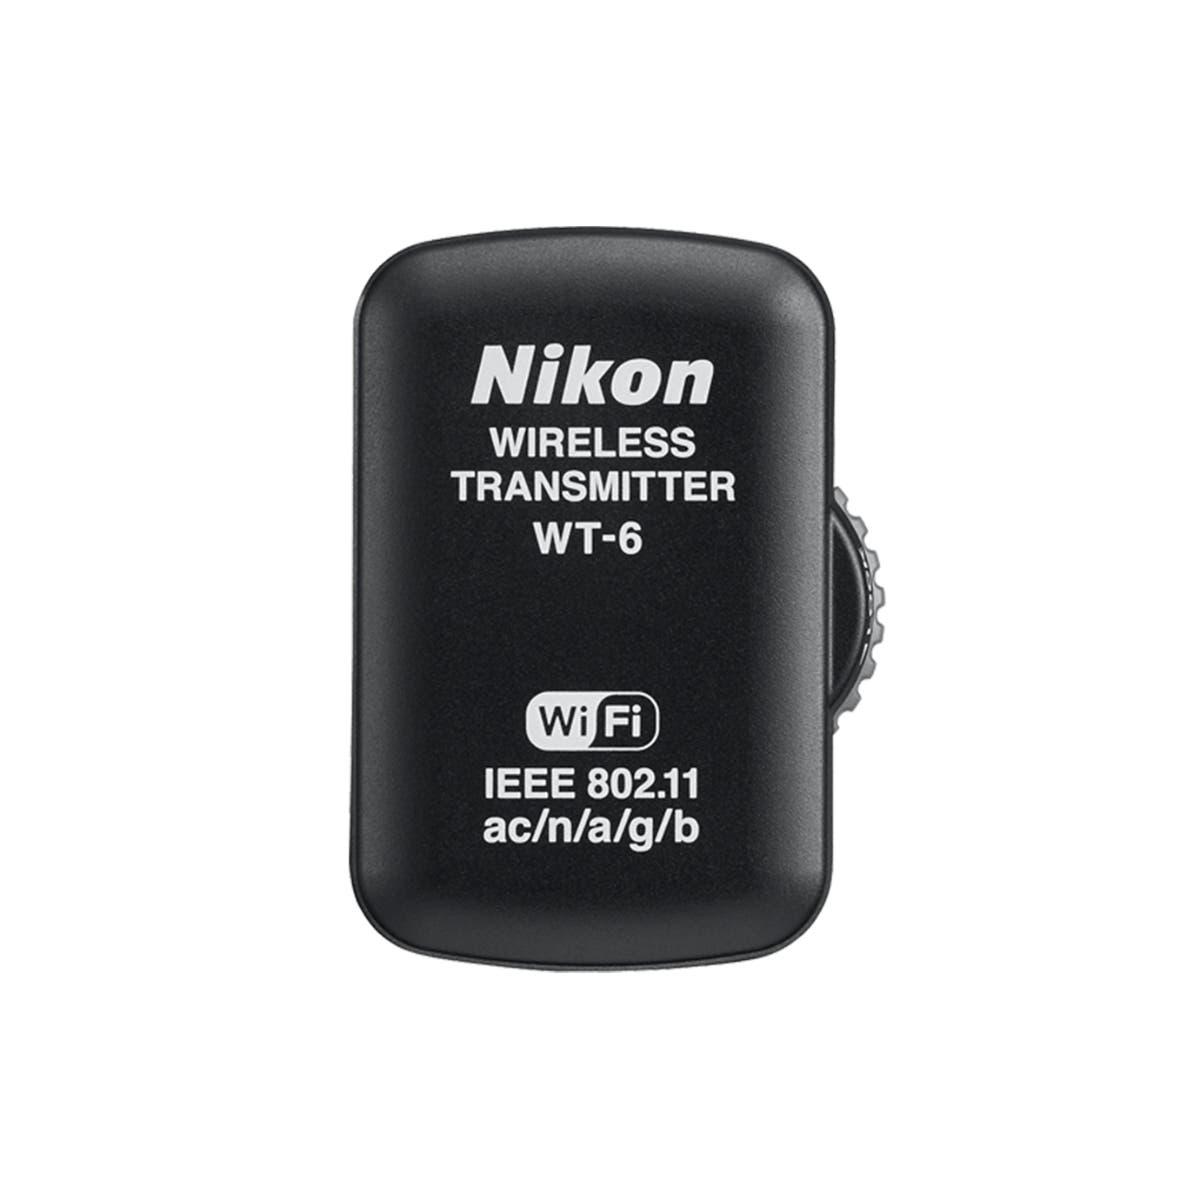 WT-6 Wireless Transmitter